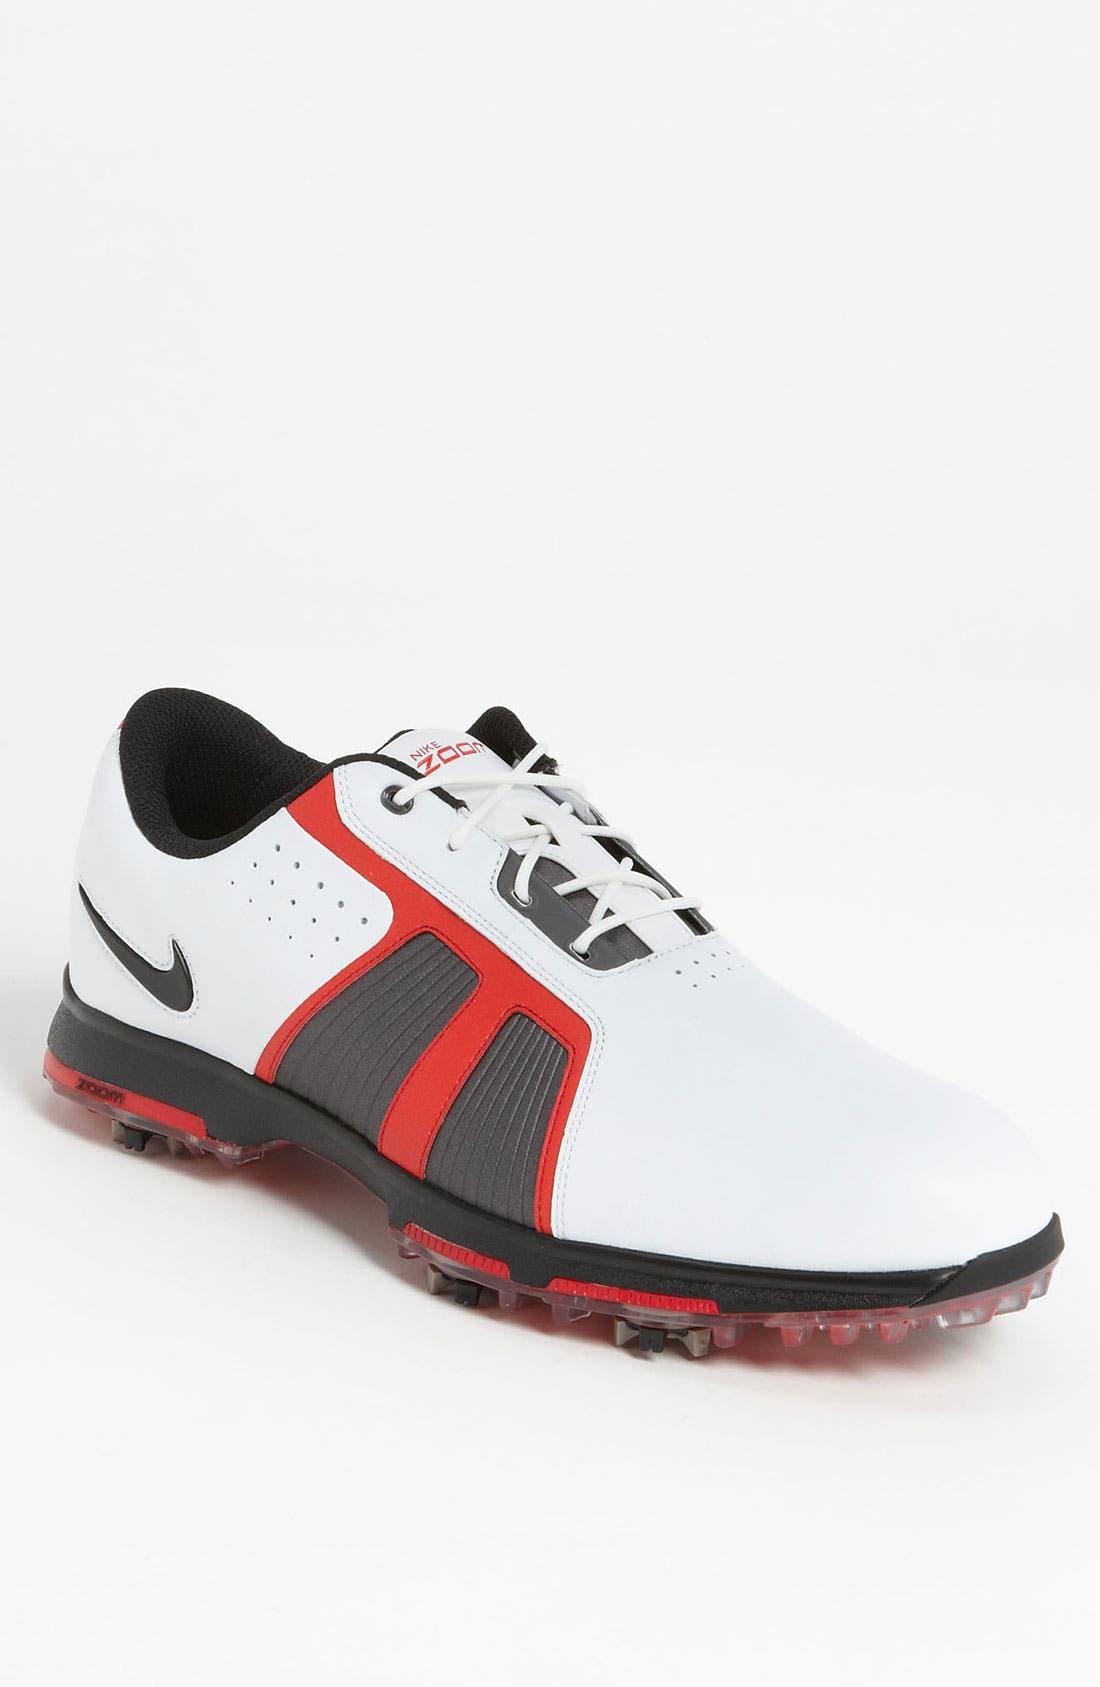 Alternate Image 1 Selected - Nike 'Zoom Trophy' Golf Shoe (Men)